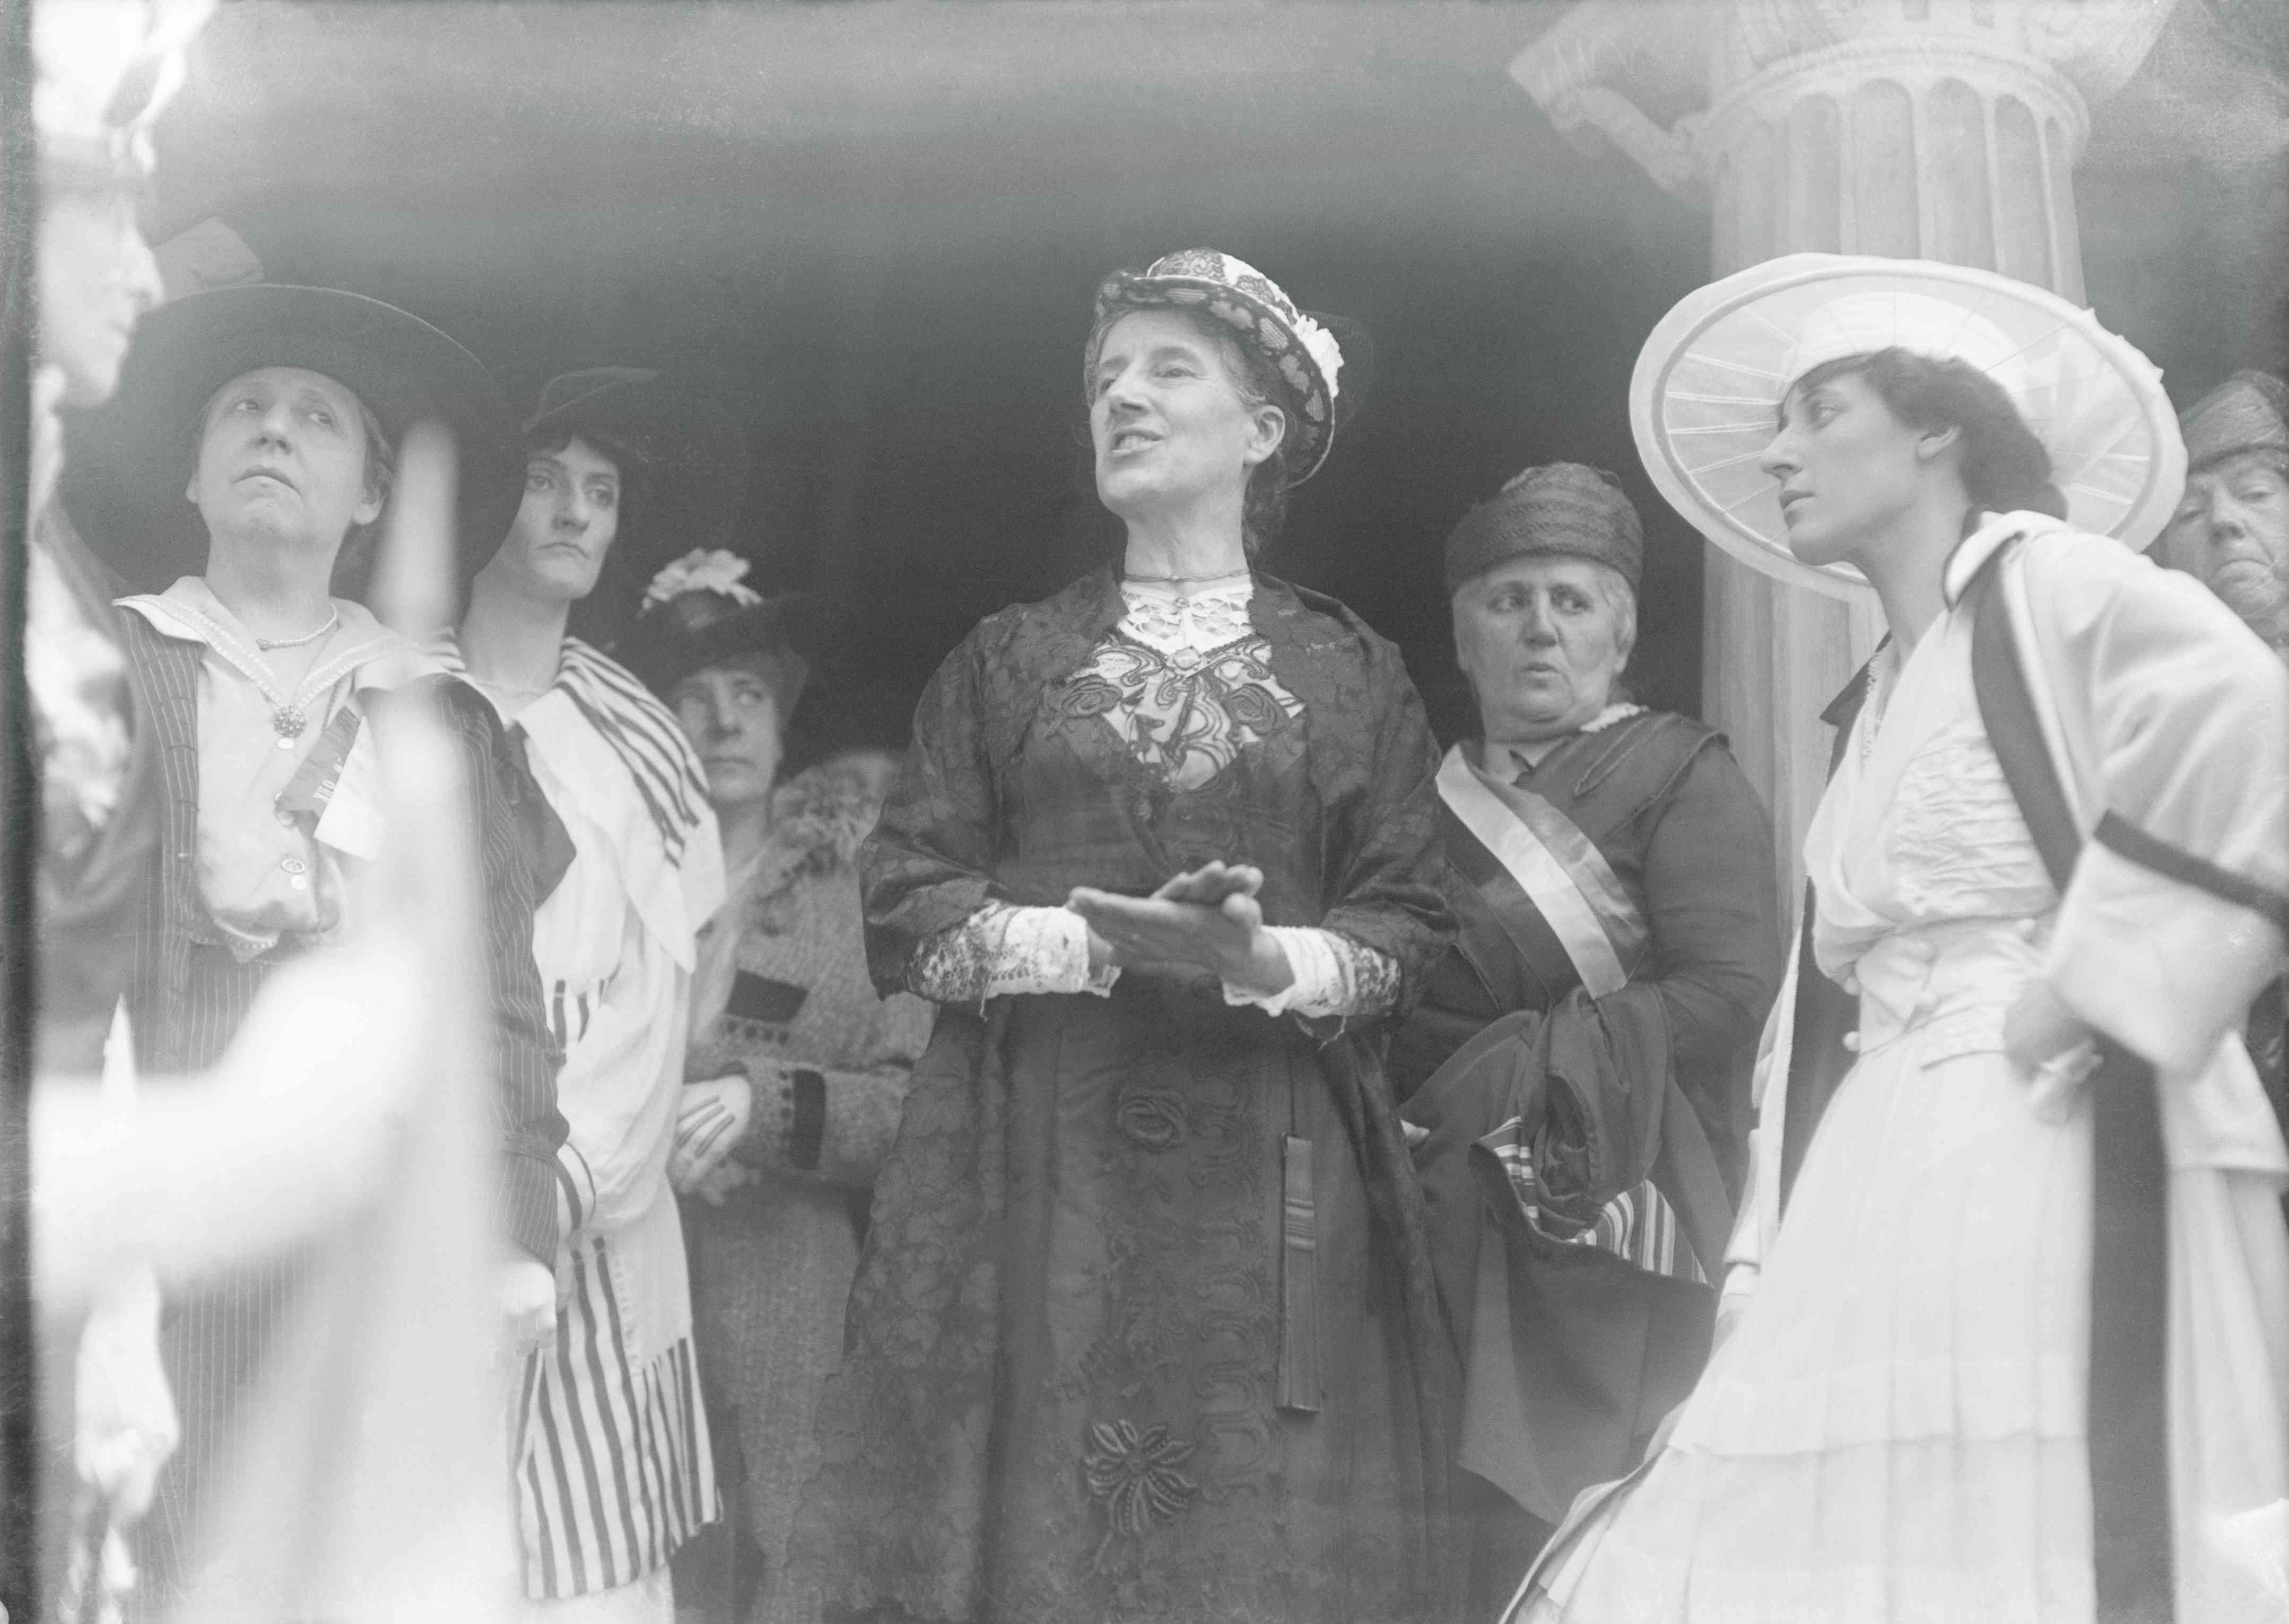 Gilman addresses a crowd of women